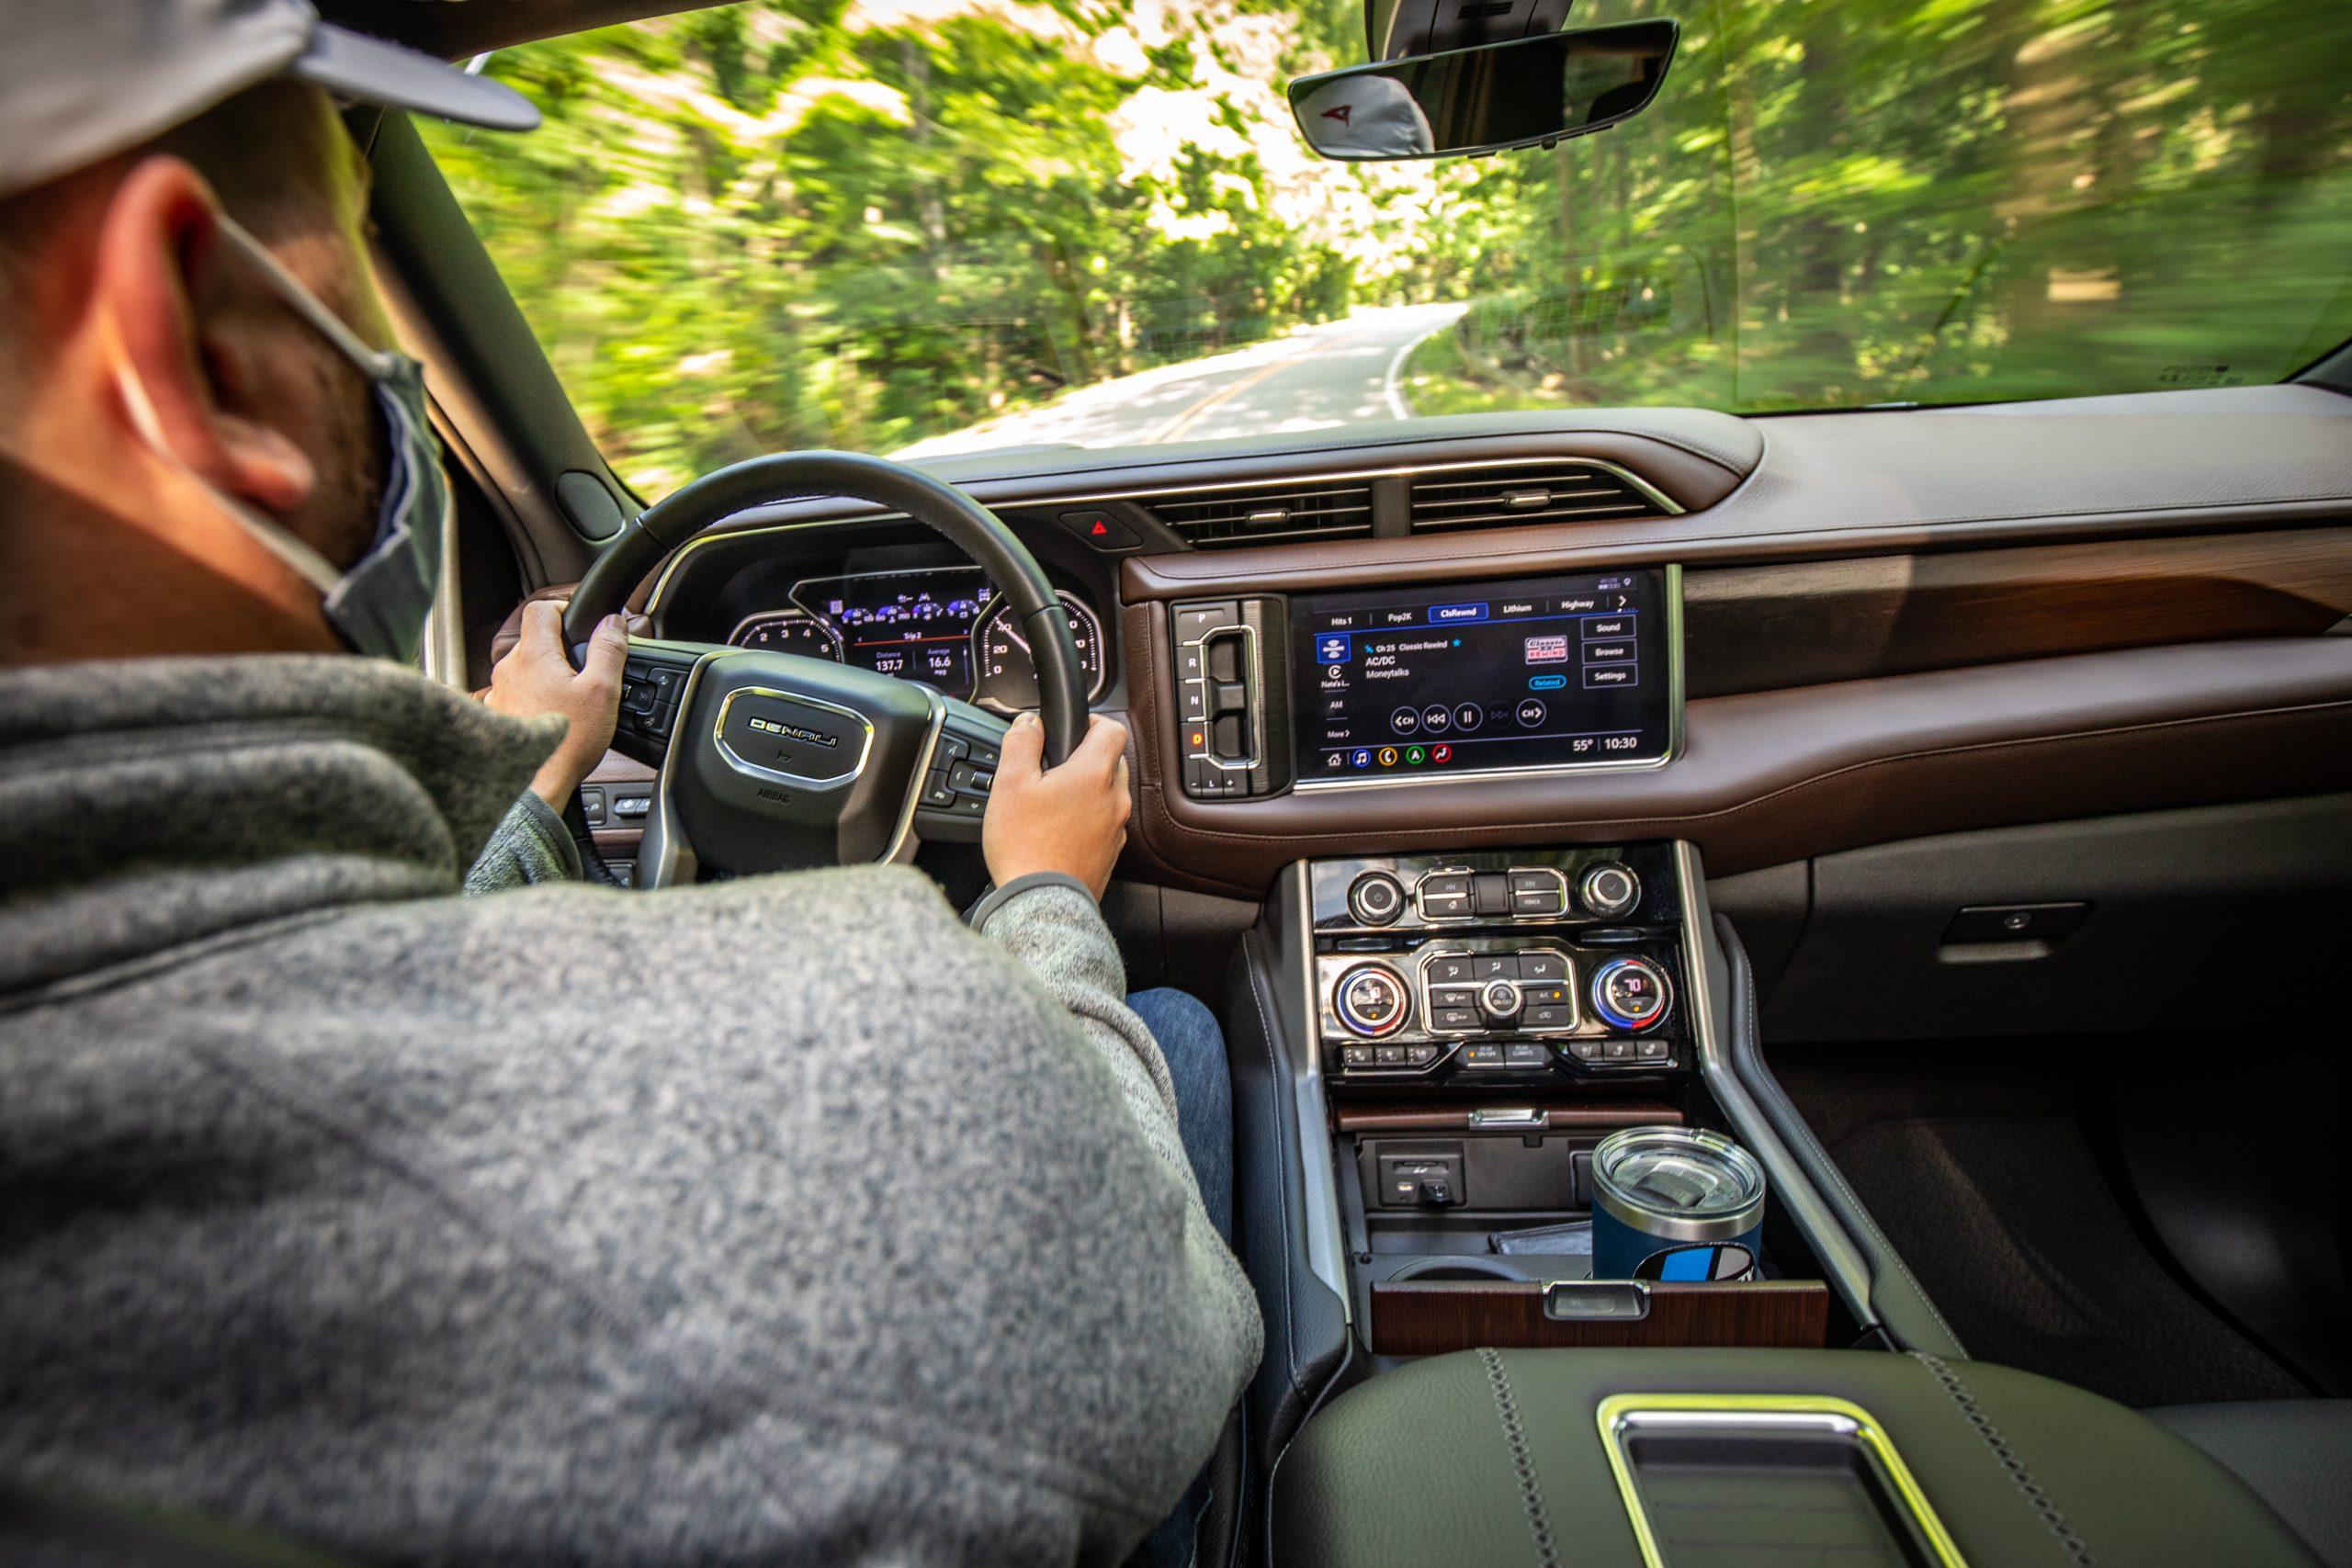 2021 Yukon Denali interior driving shot